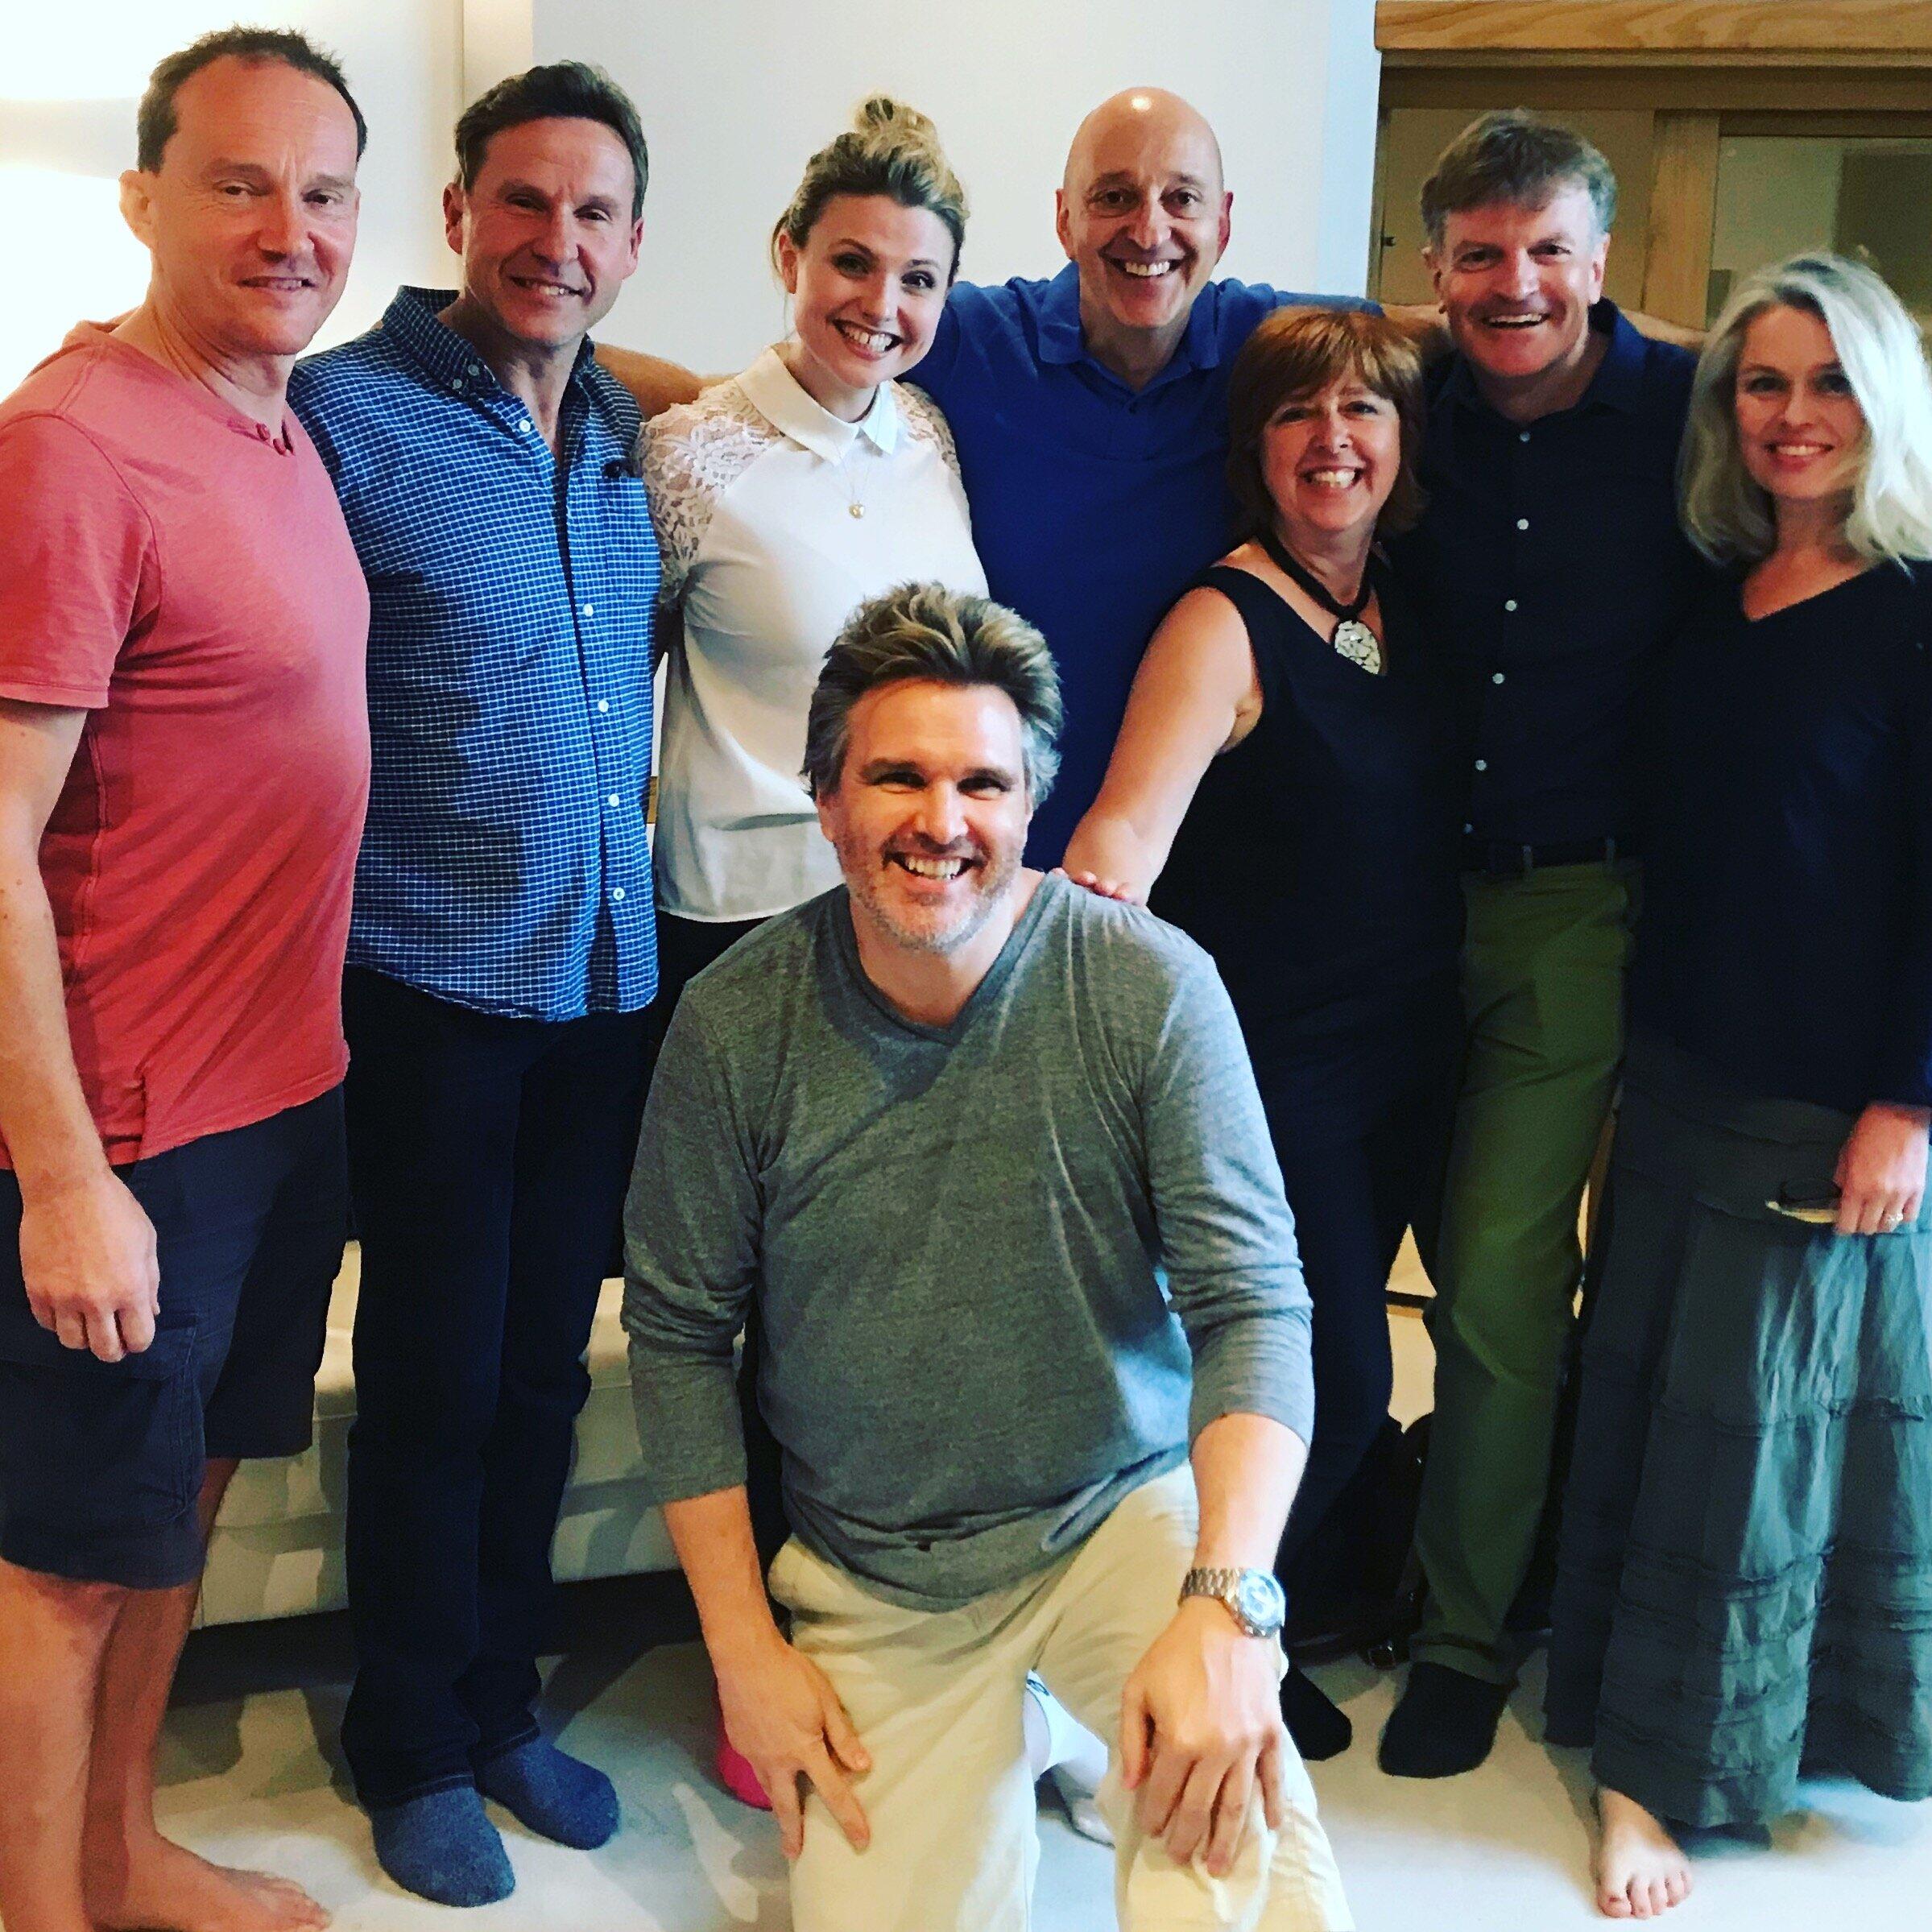 The happy Bing team!